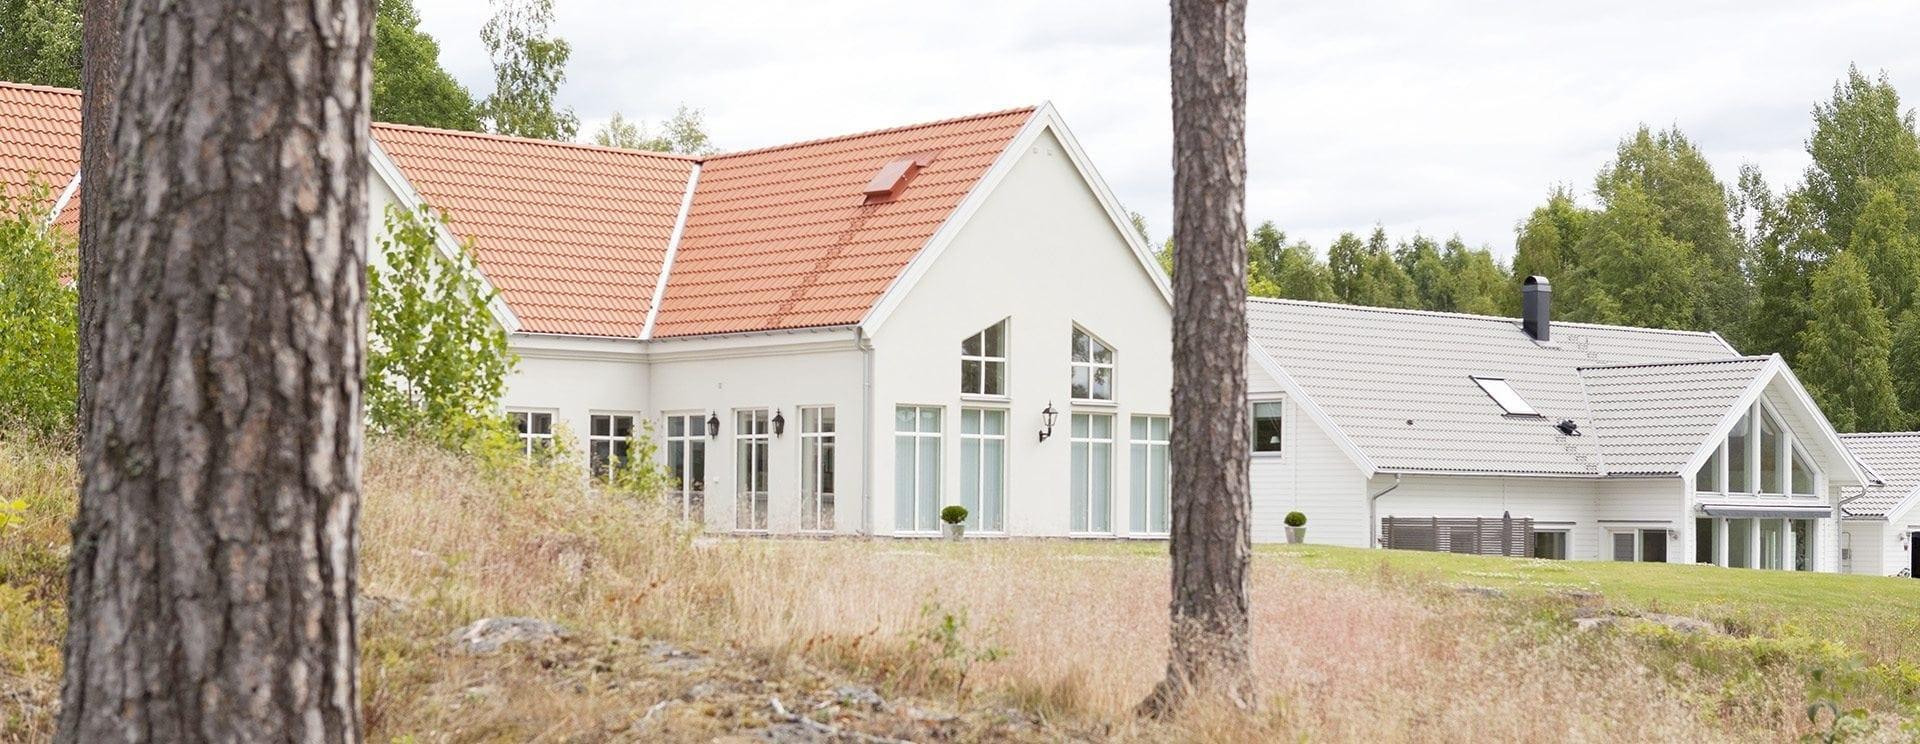 Två nybyggda hus